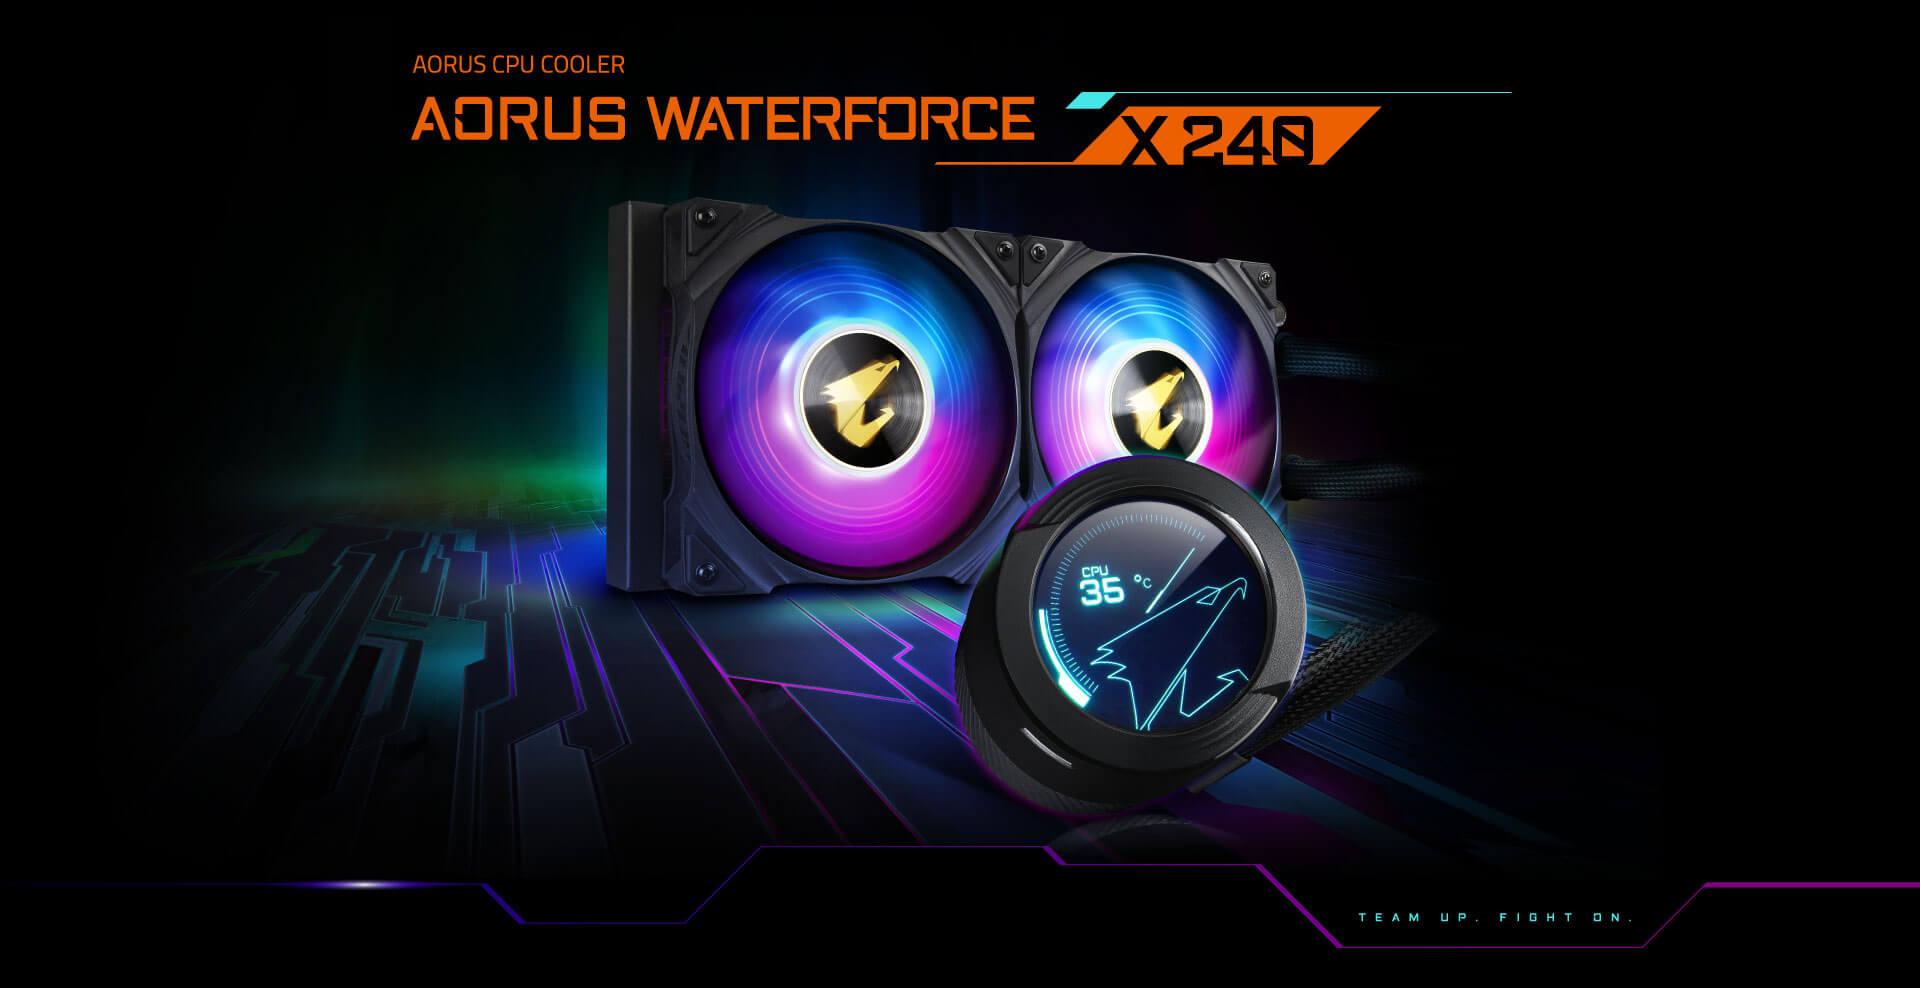 Gigabyte Aorus waterforce X 240 - LIQUID COOLER X 240 6